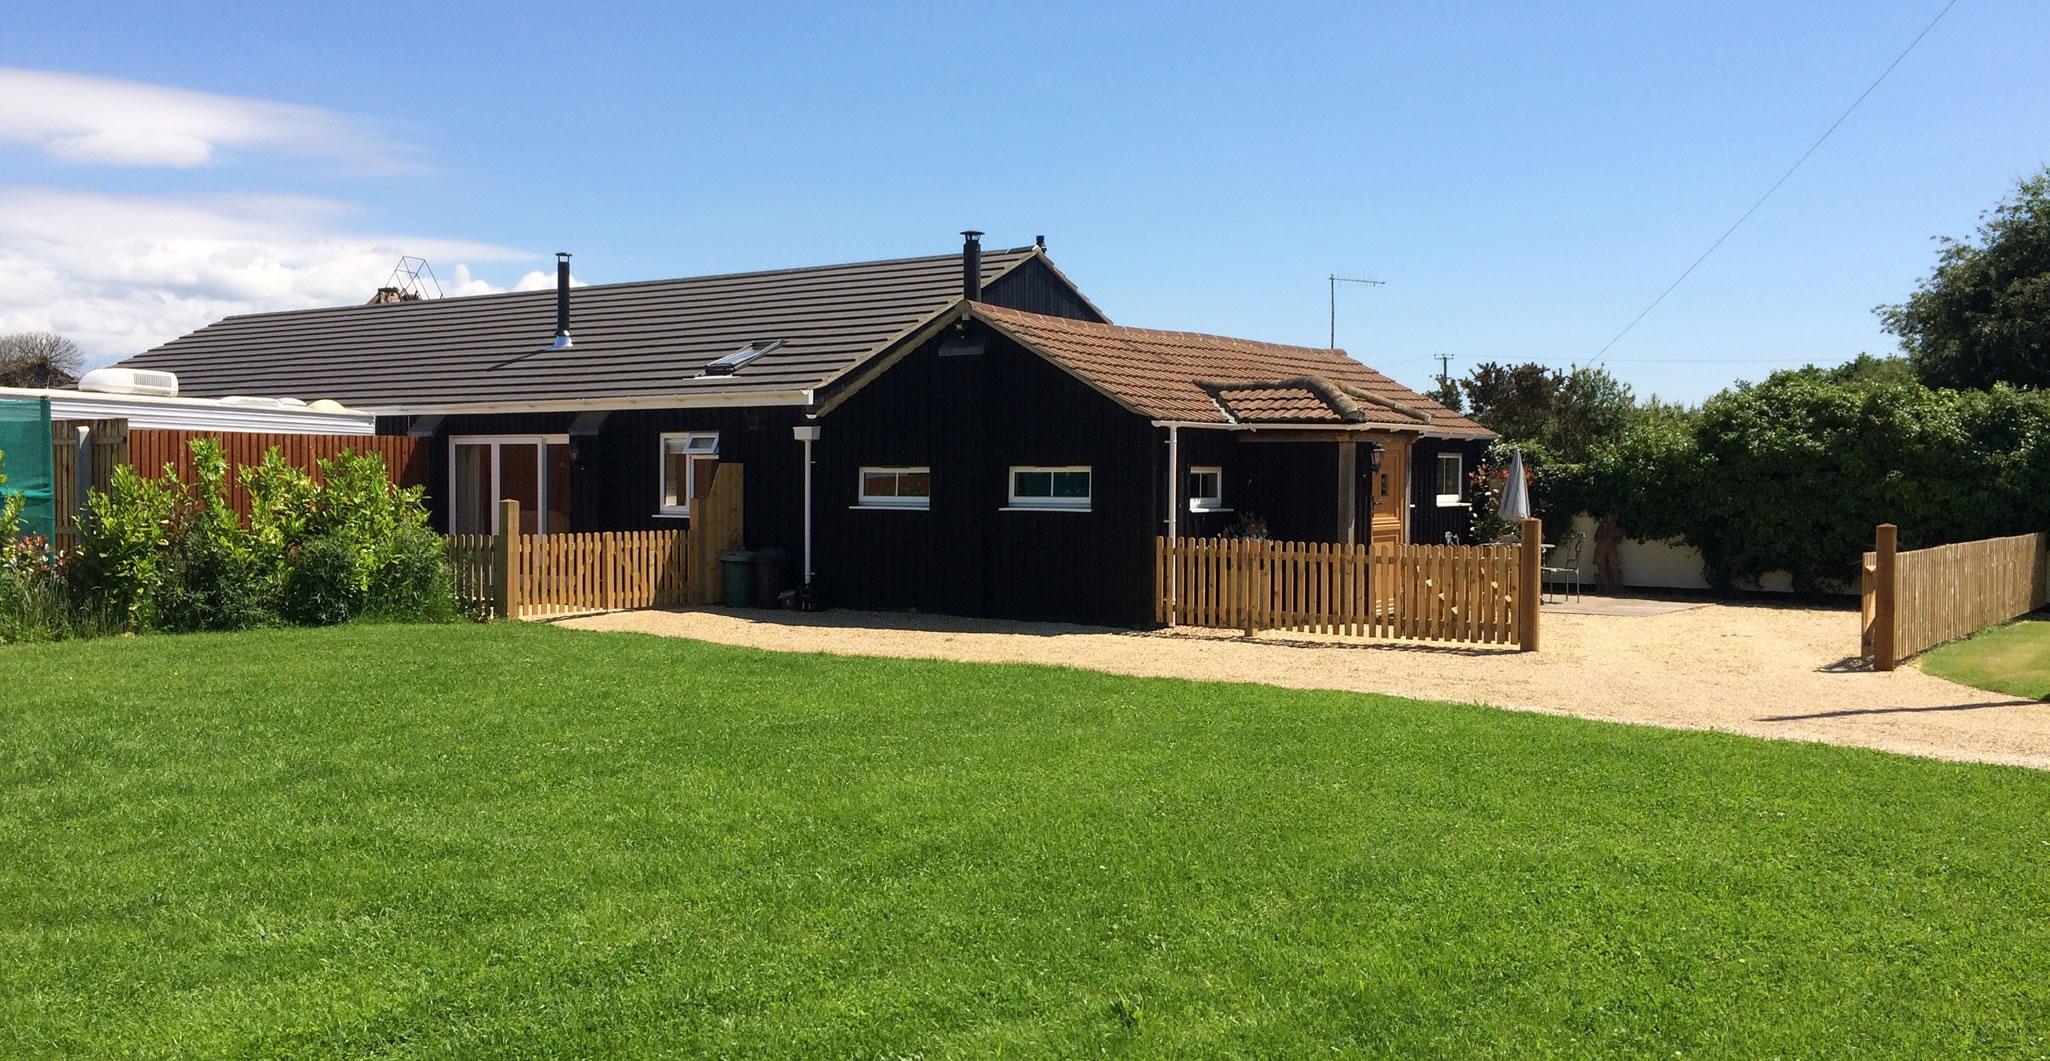 Foxhill Farm, Alderholt, Dorset - Barn Cottage